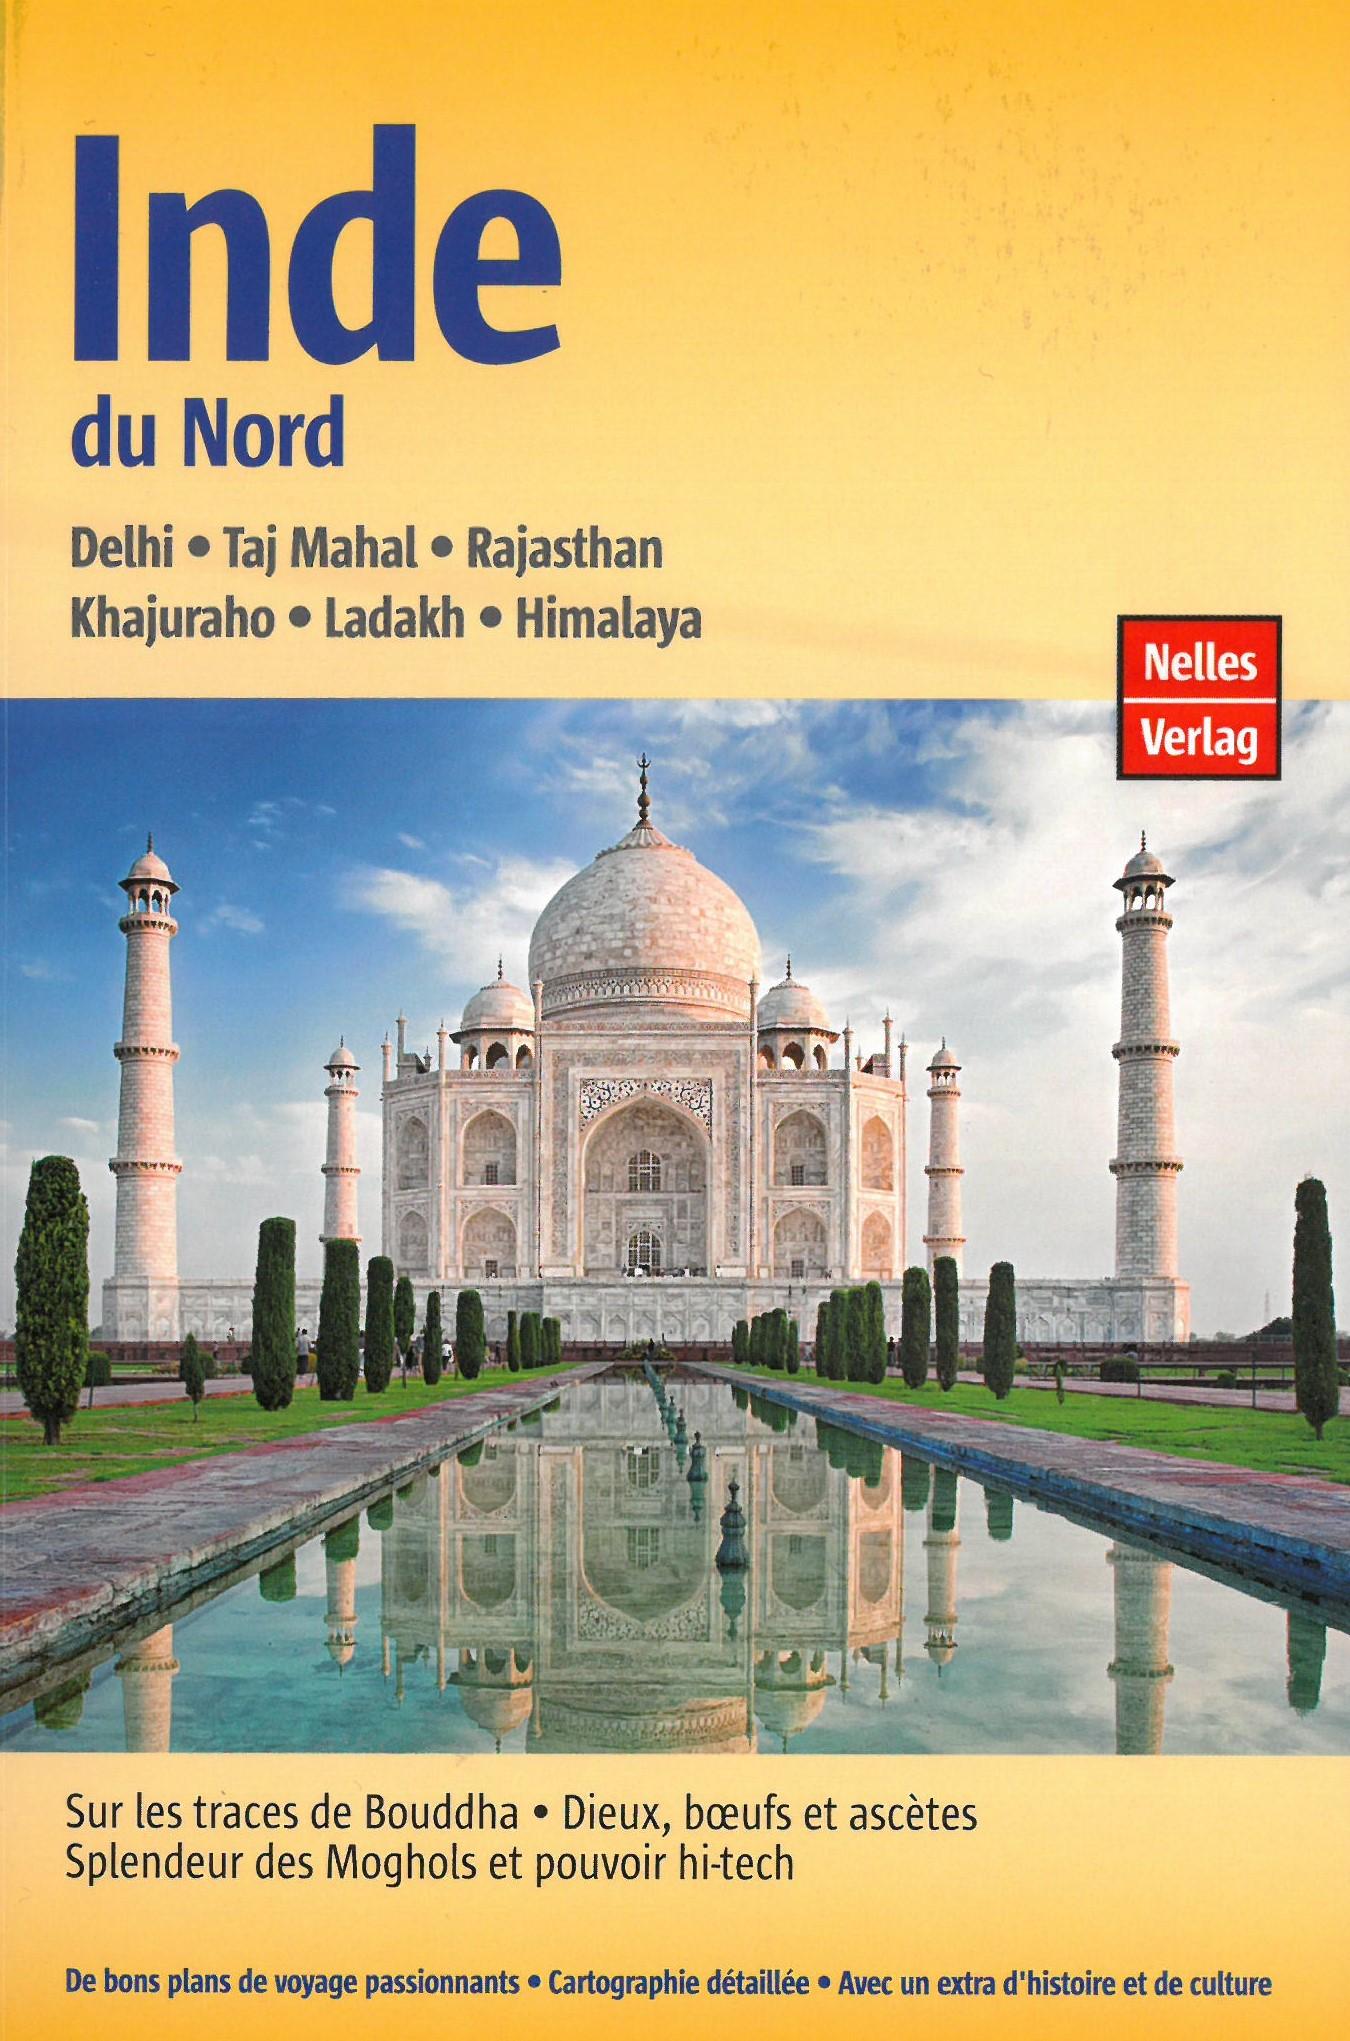 Inde du Nord Dehli-Taj-Mahal-Rajastan-Him.